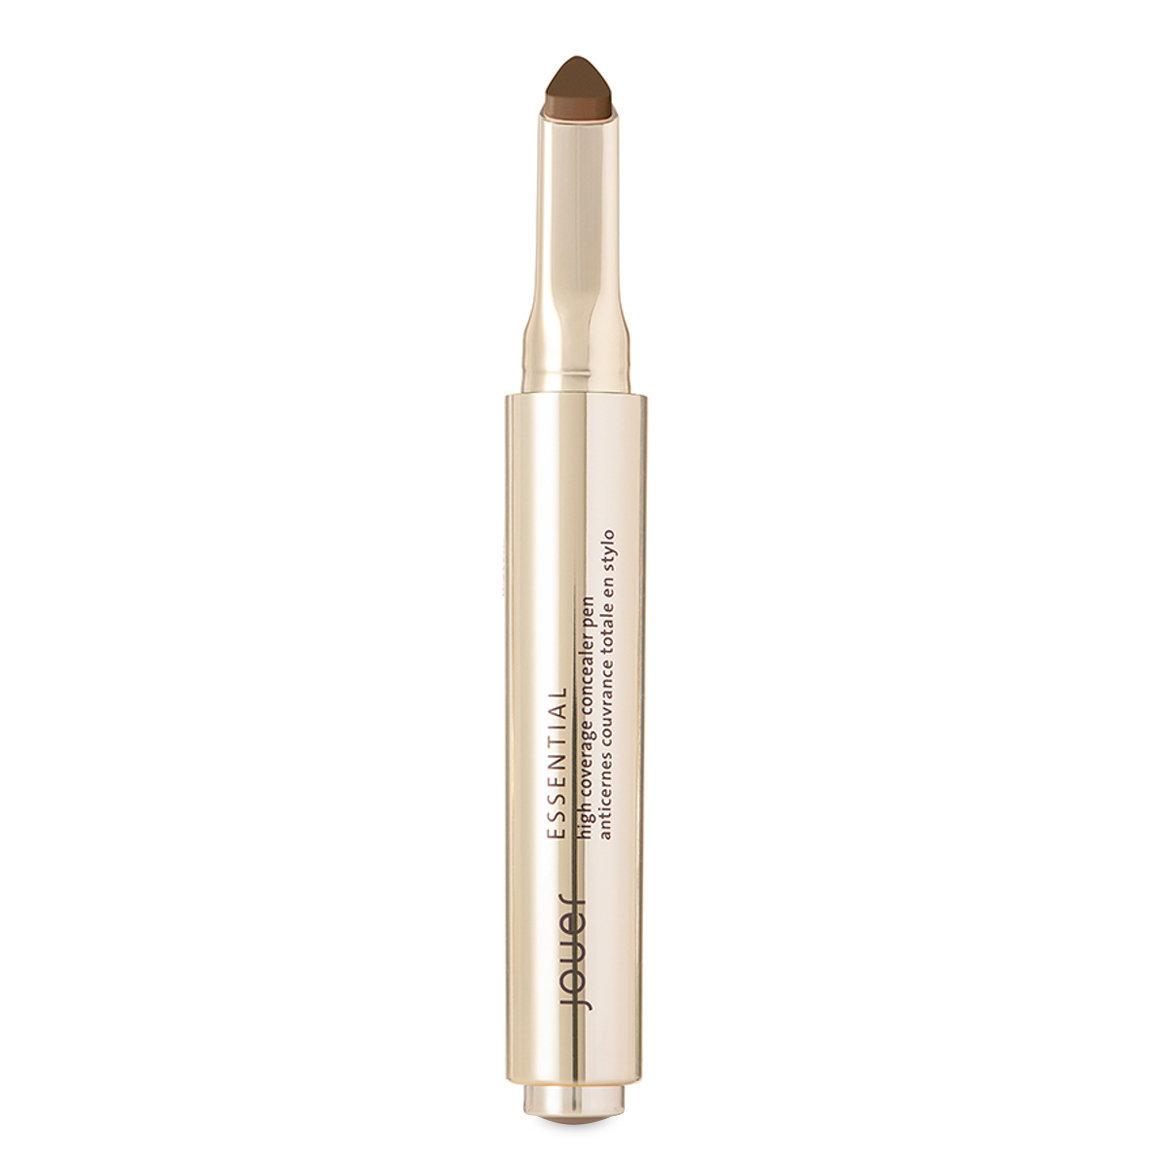 Jouer Cosmetics Essential High Coverage Concealer Pen Filigree